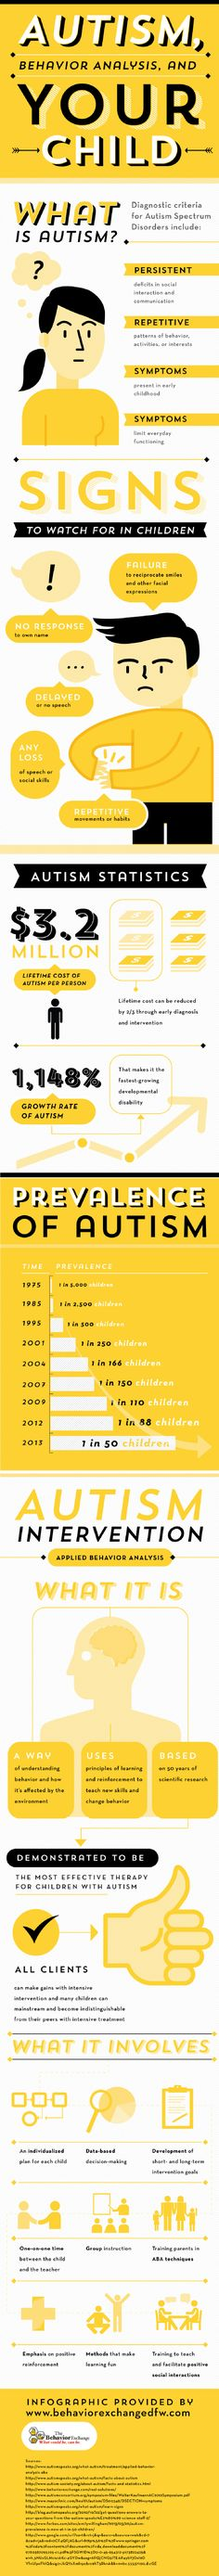 Autism, Behavior Analysis, And Your Child